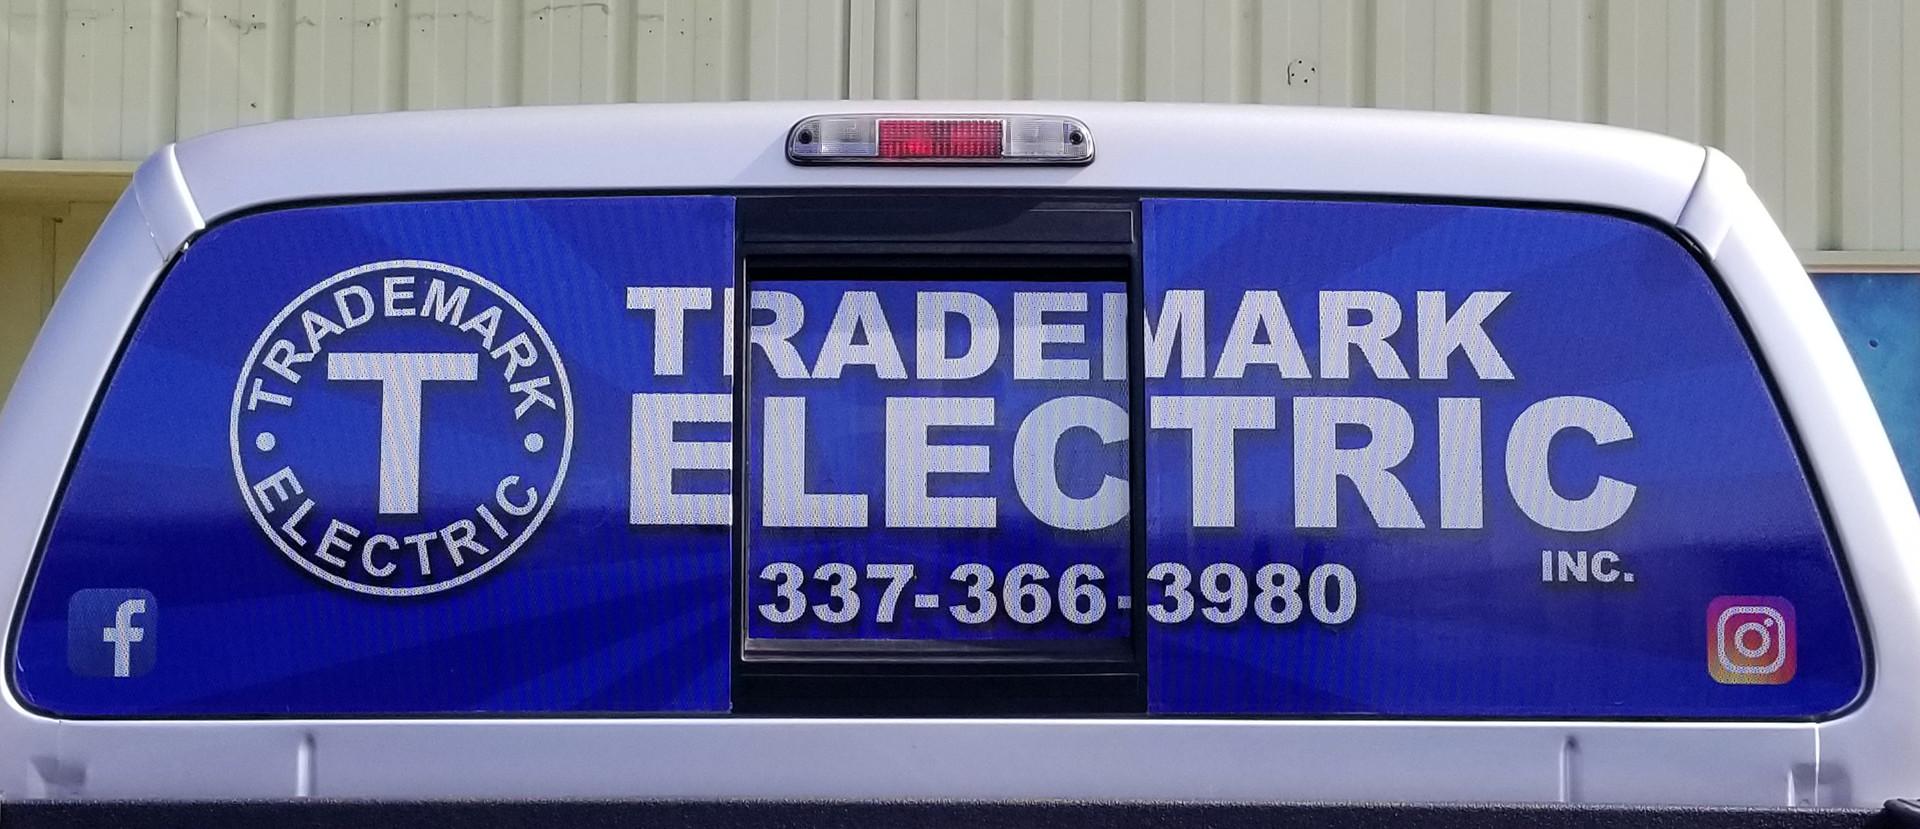 Trademark Electric Window Perf.jpg